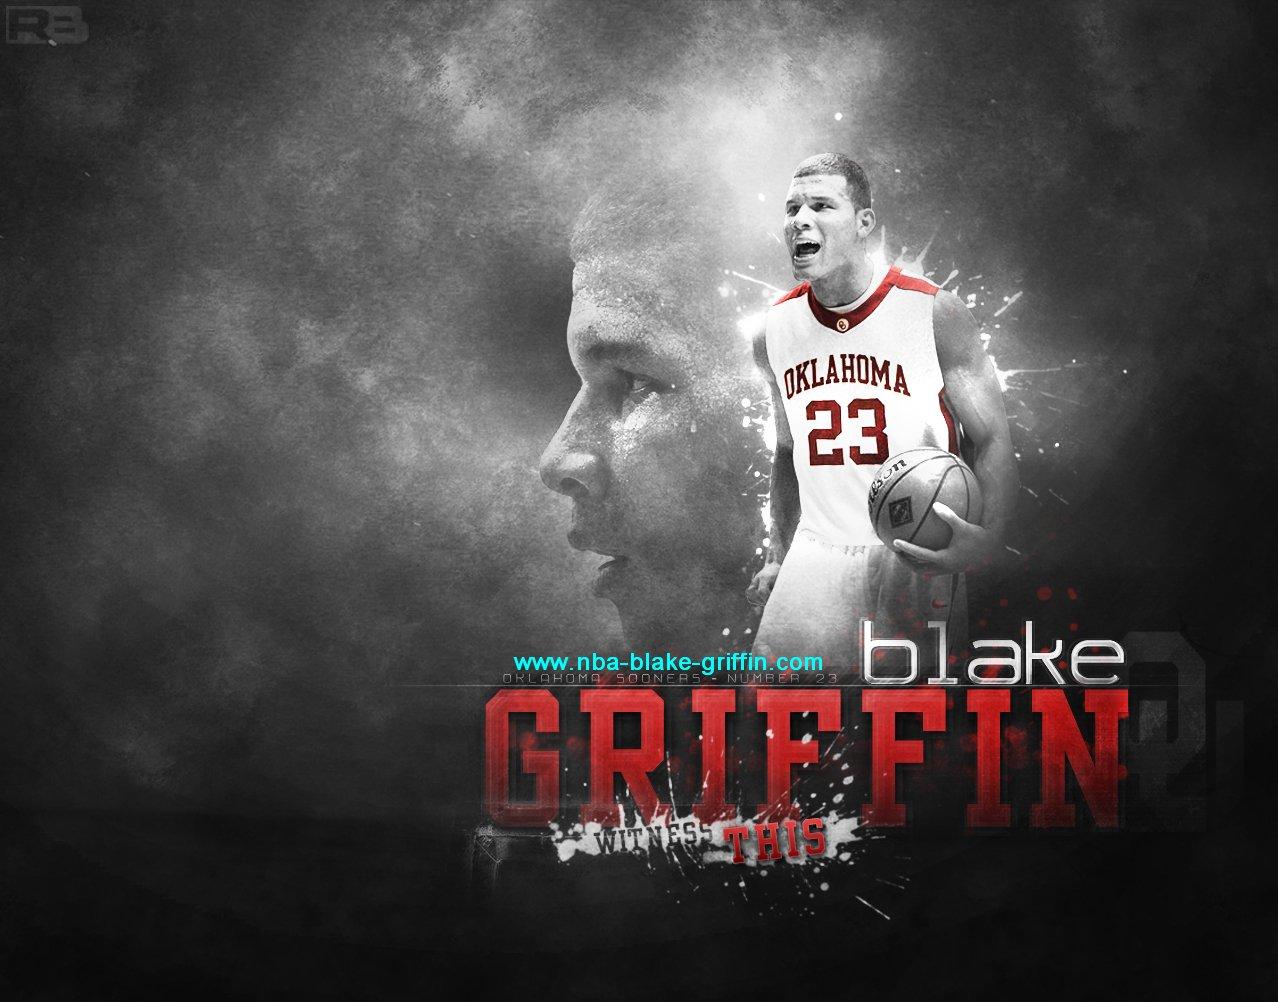 blake blake griffin backgrounds